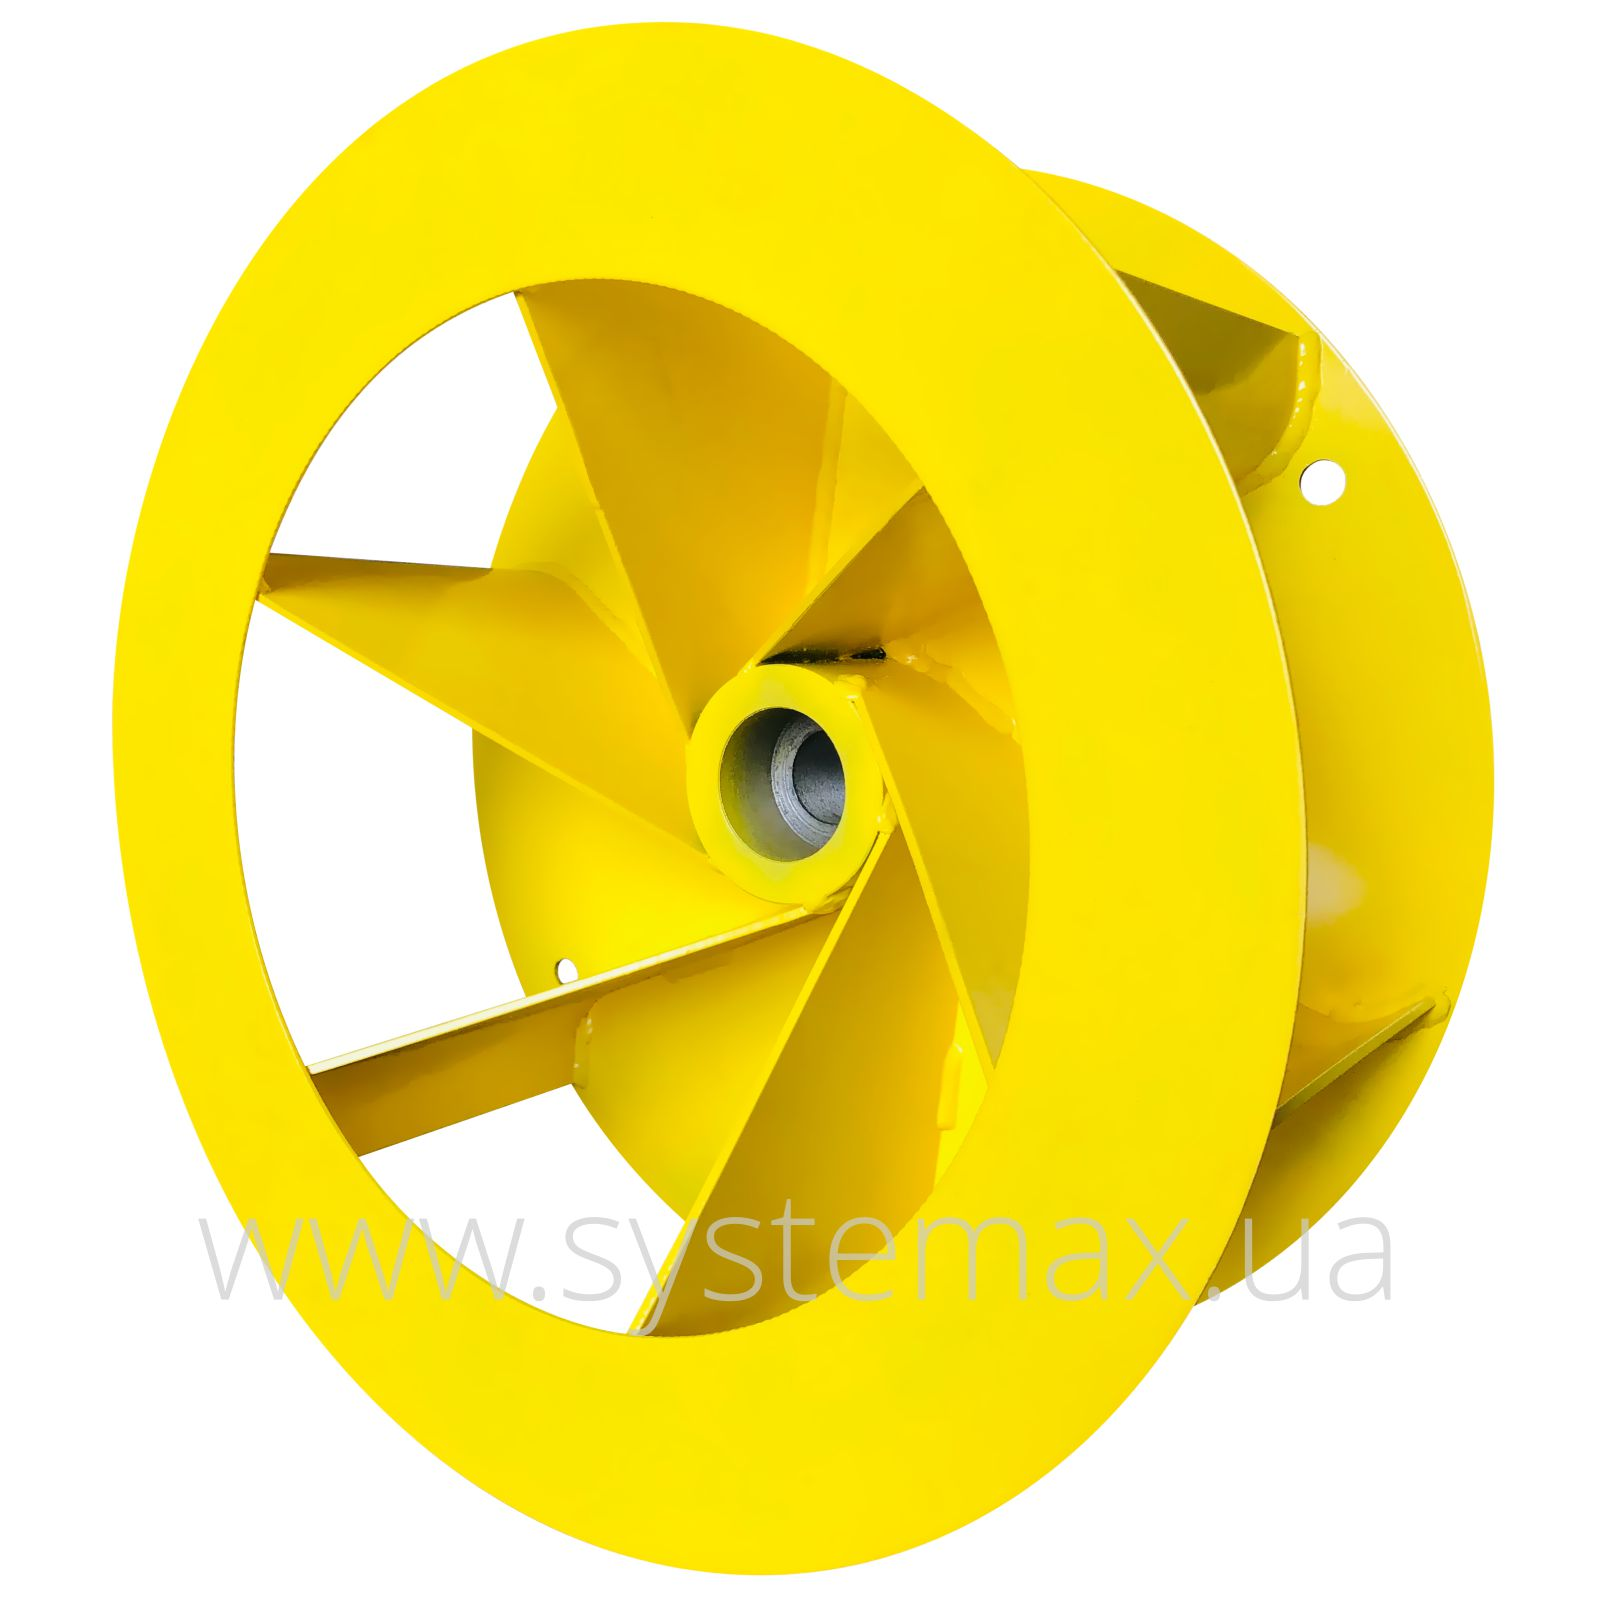 Фото робочого колеса пилового вентилятора ВЦП 6-46-4